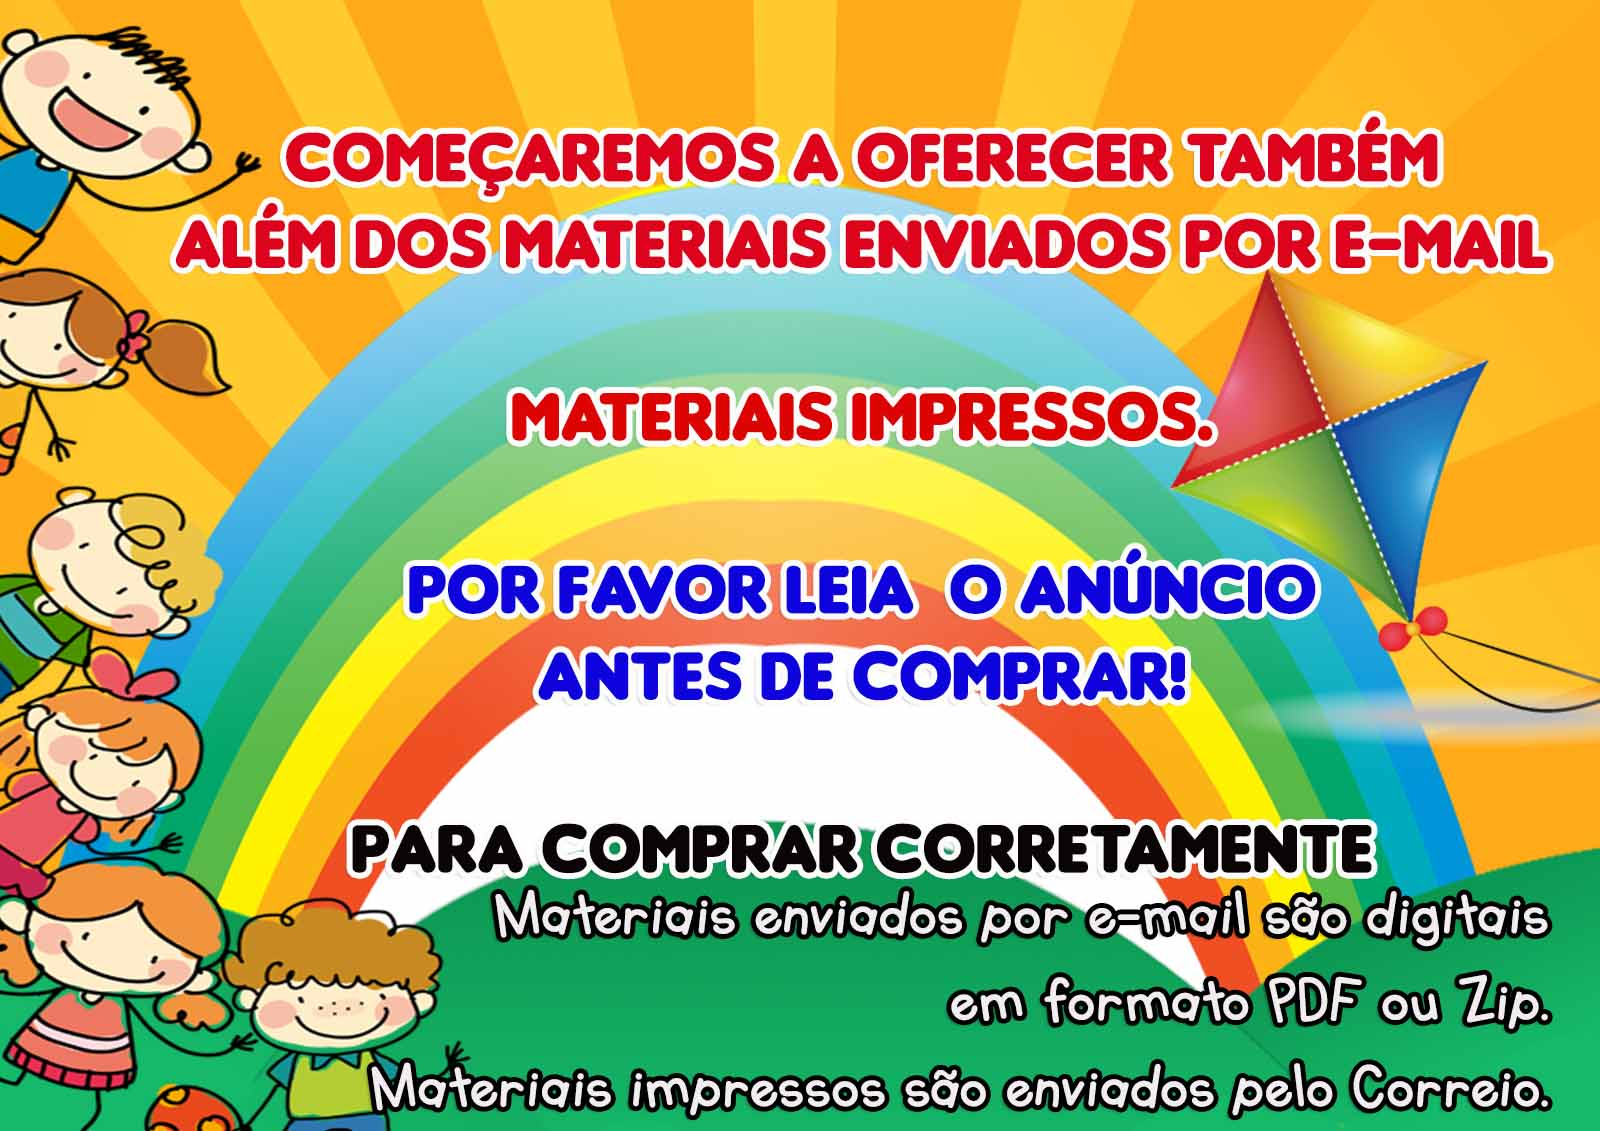 1.bp.blogspot.com/-2_Zu0ZMqHbU/XHw9AqlHqqI/AAAAAAABKGM/5lfwQllVn-wrwZ-JCTPVvnQWwXPkKN5BgCLcBGAs/s1600/materiais%2Bimpressos%2Bloja%2Bespa%25C3%25A7o%2Beducar.jpg